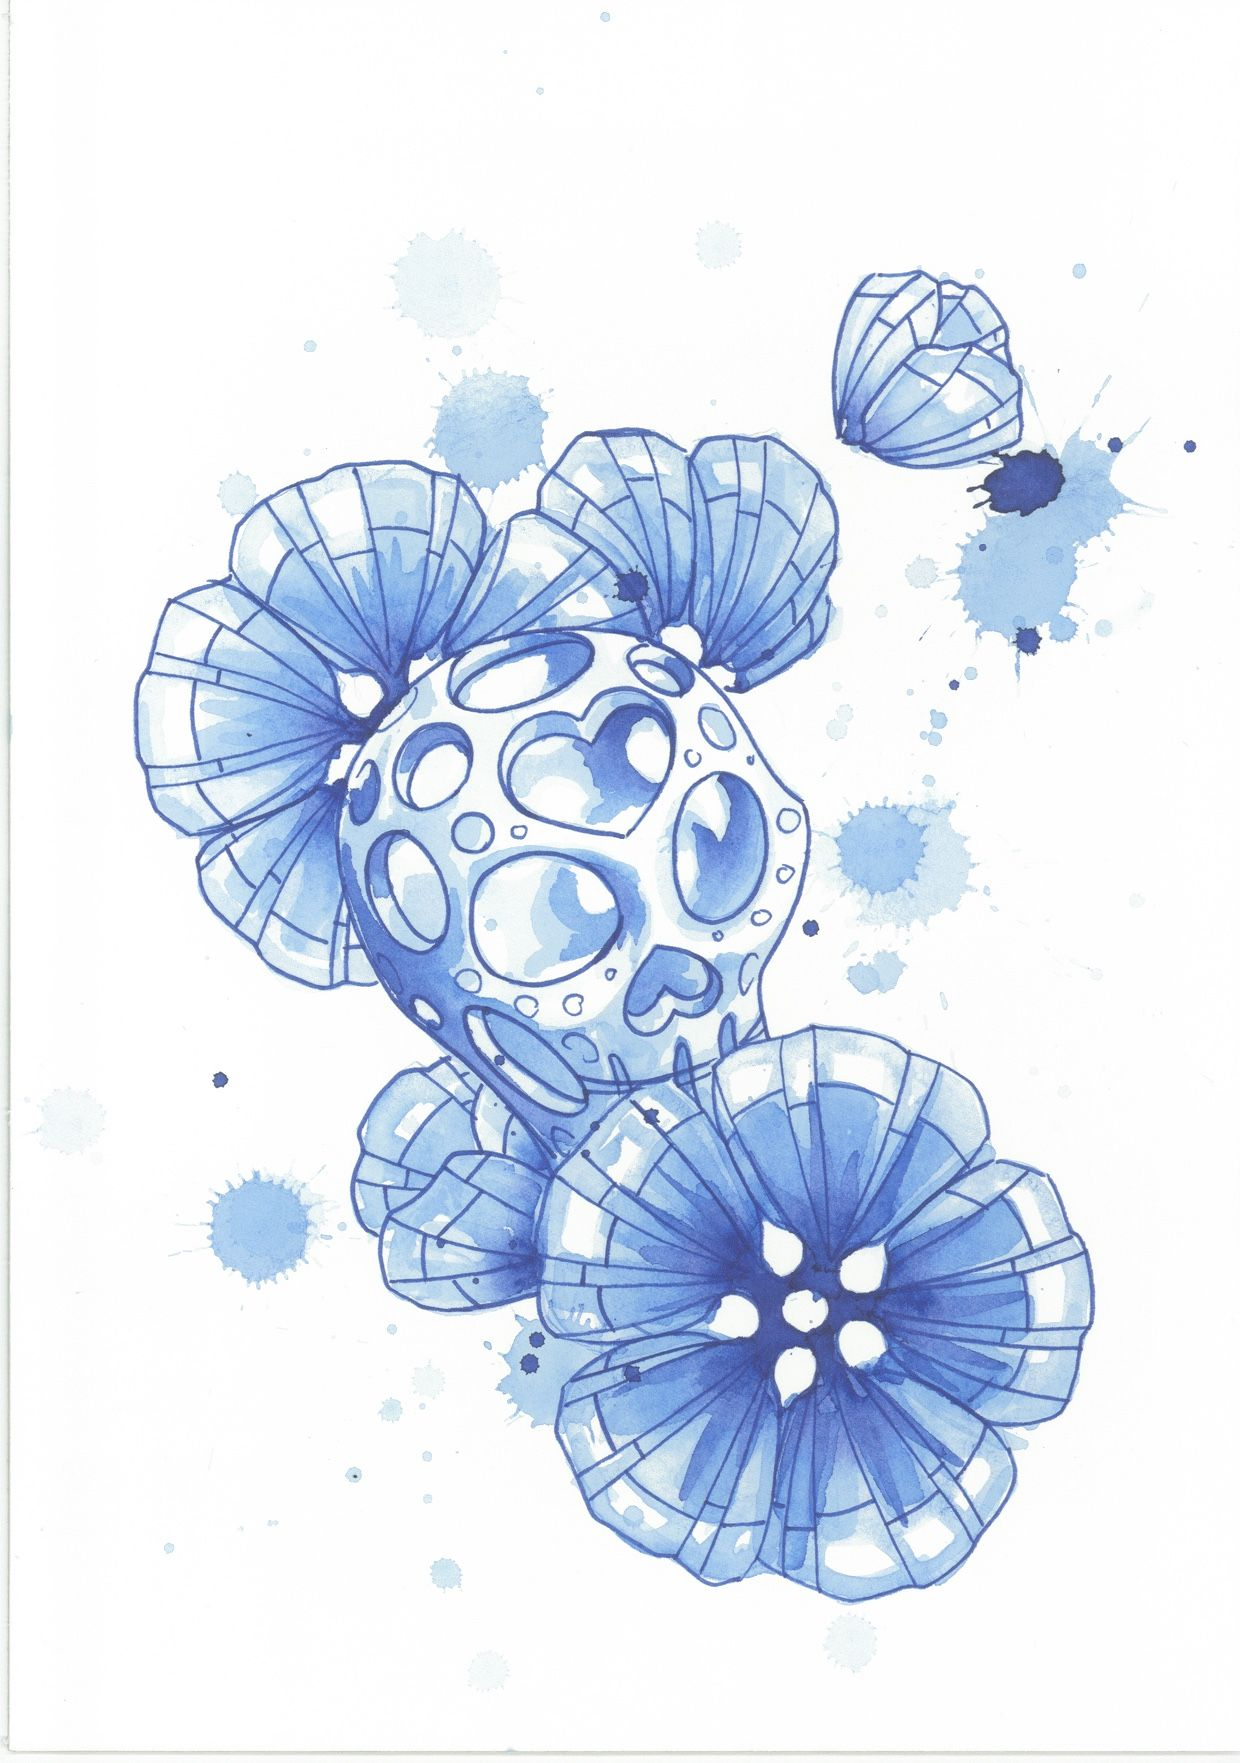 Flaschenetikett Watercolour